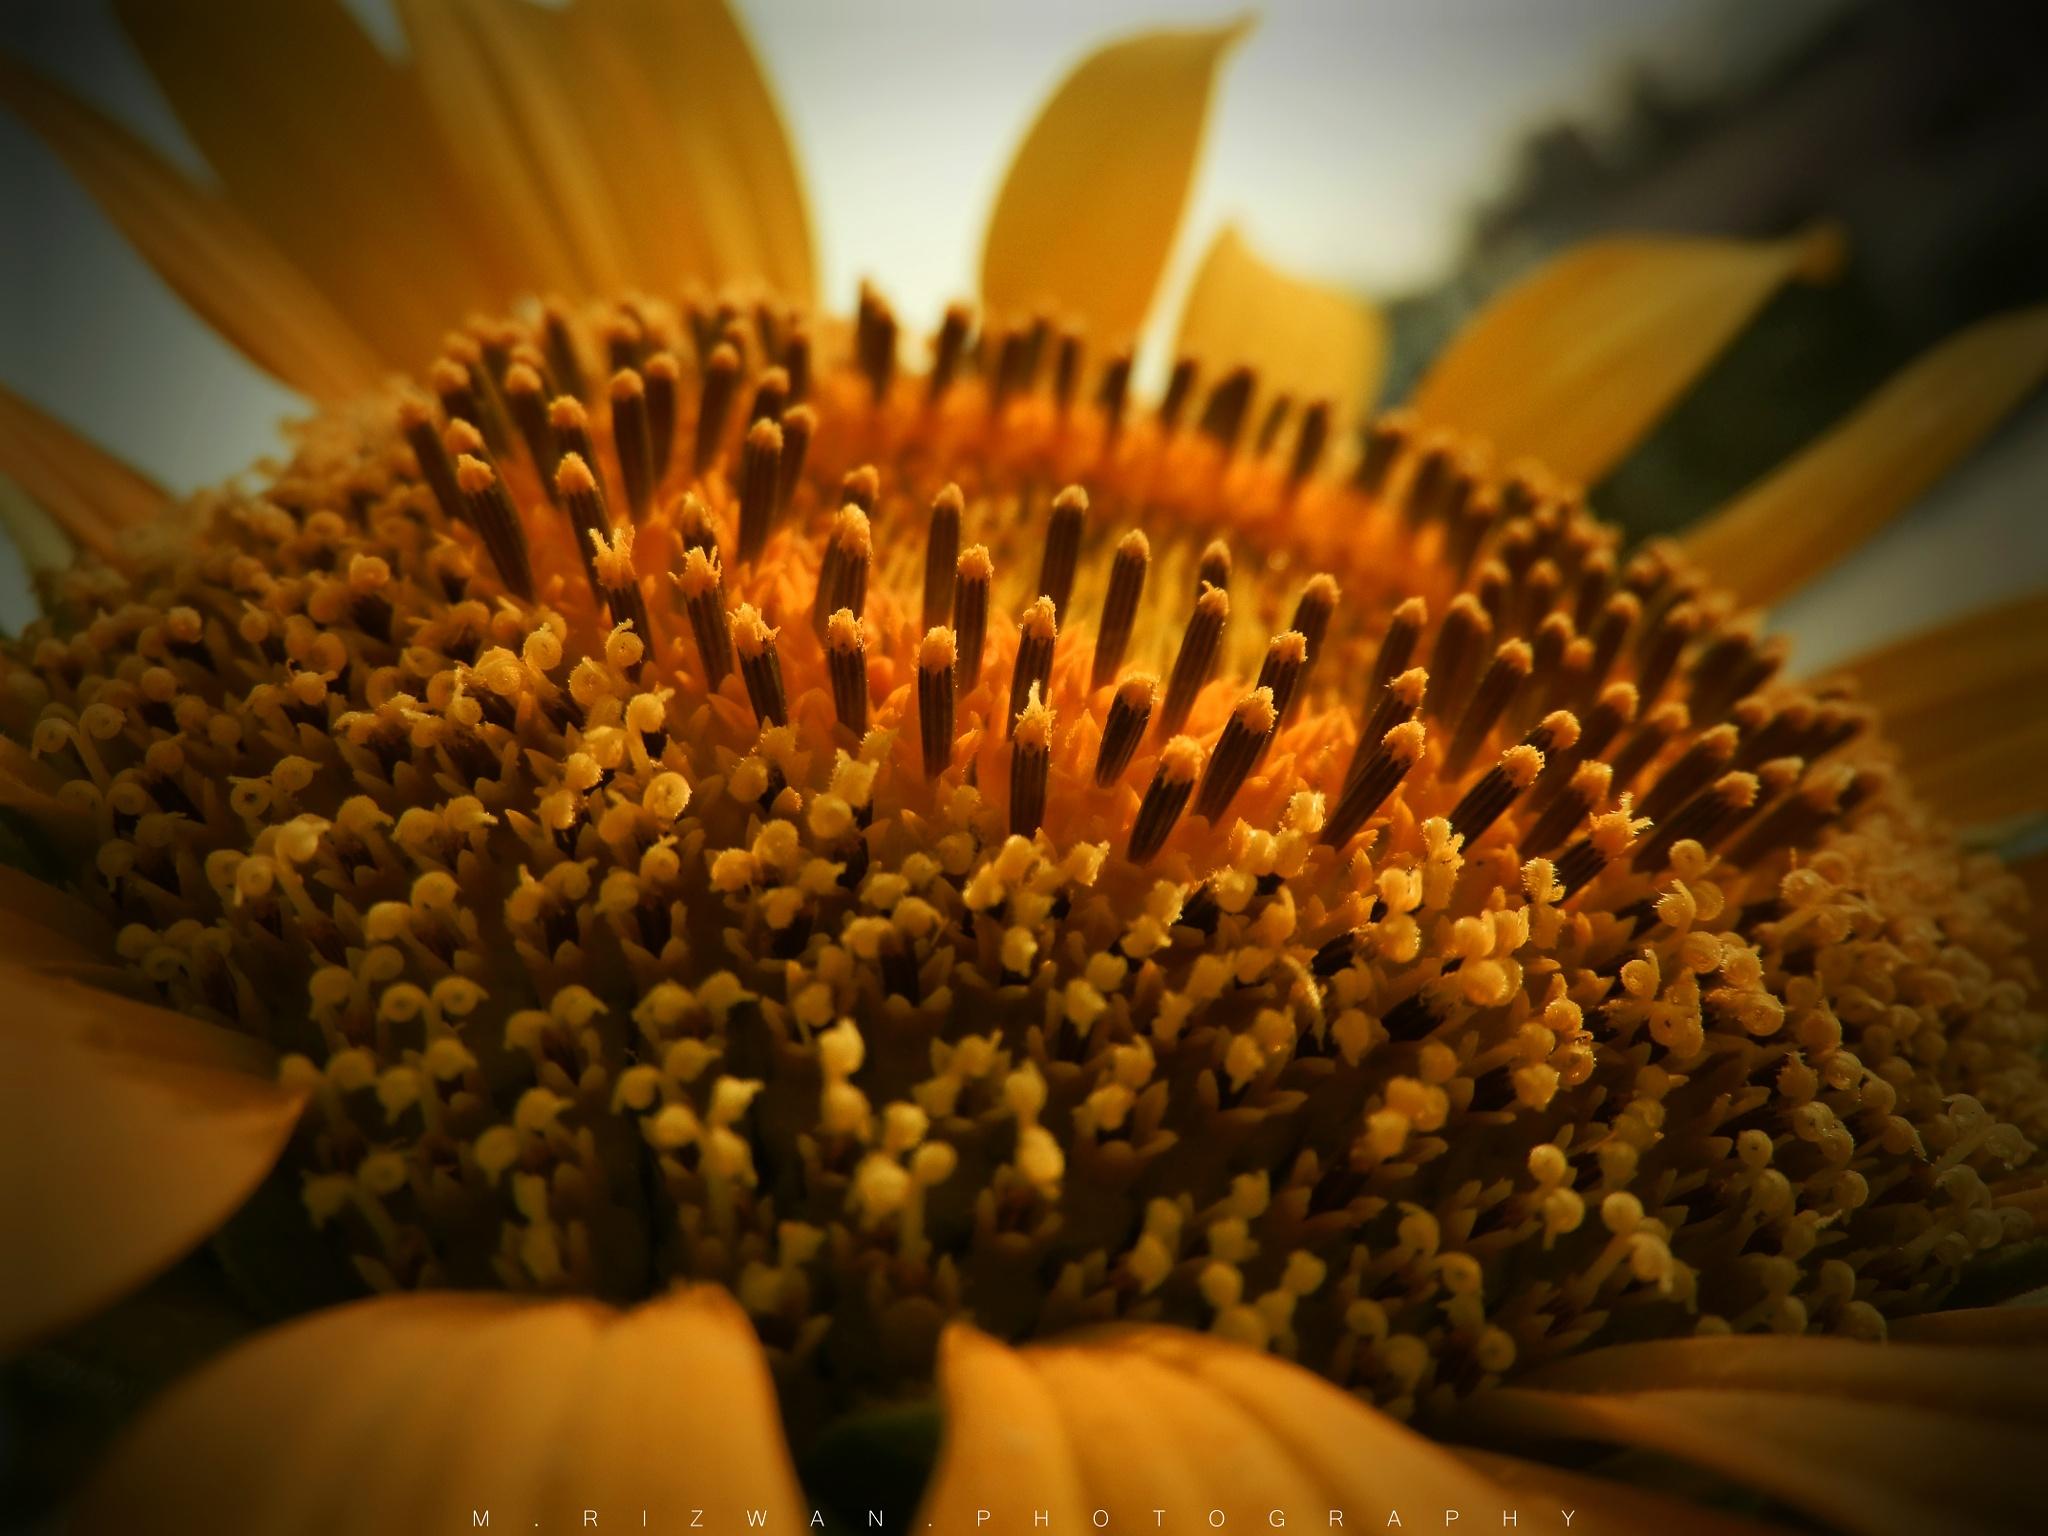 Sunflower by Rizwan